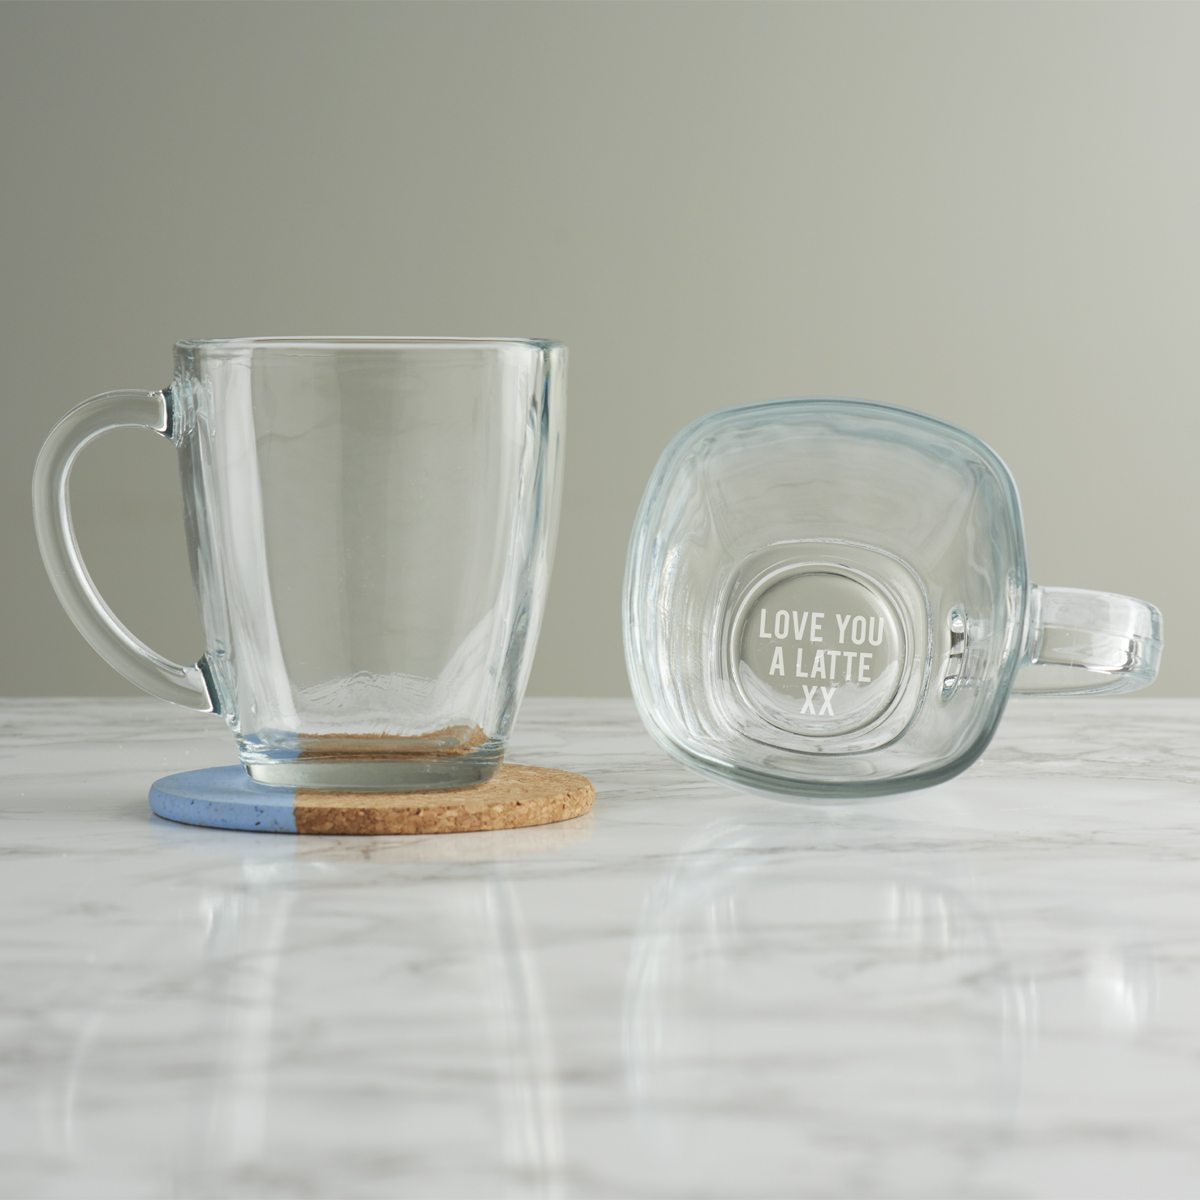 Personalised 'Love You A Latte' Mug